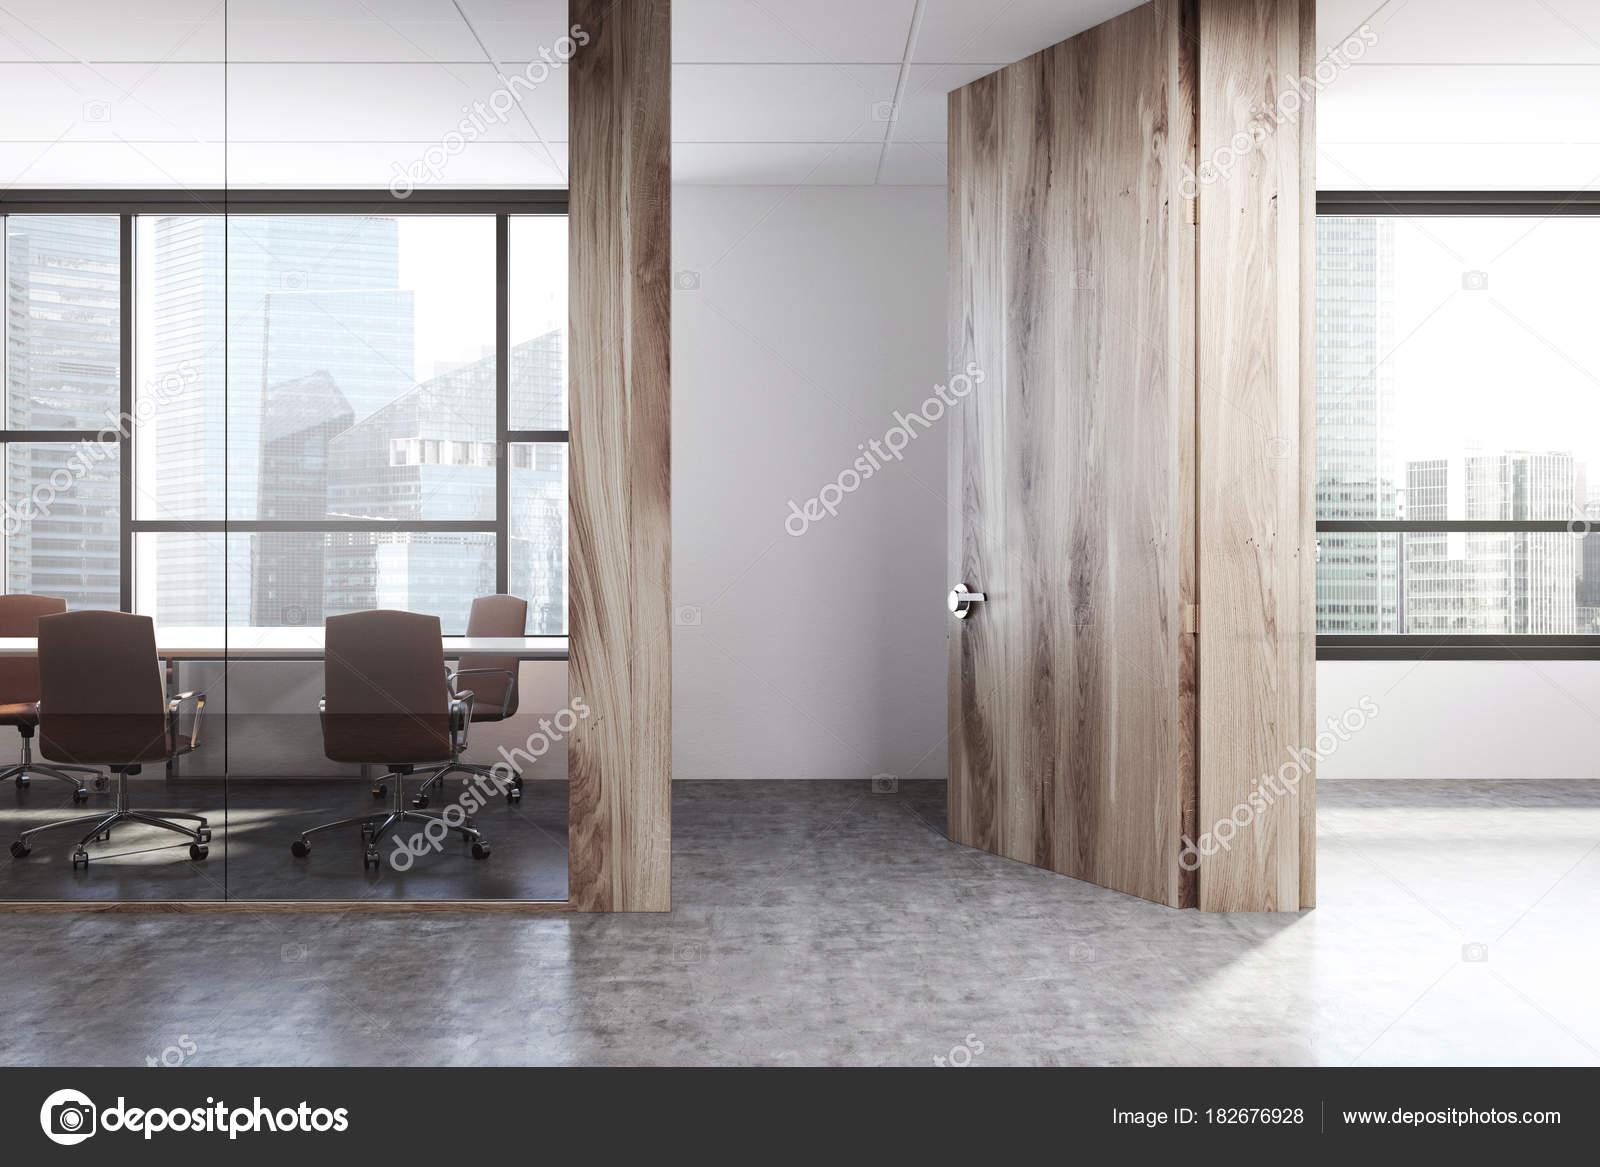 Ufficio Bianco E Legno : Ufficio bianco e legno sala riunioni u foto stock